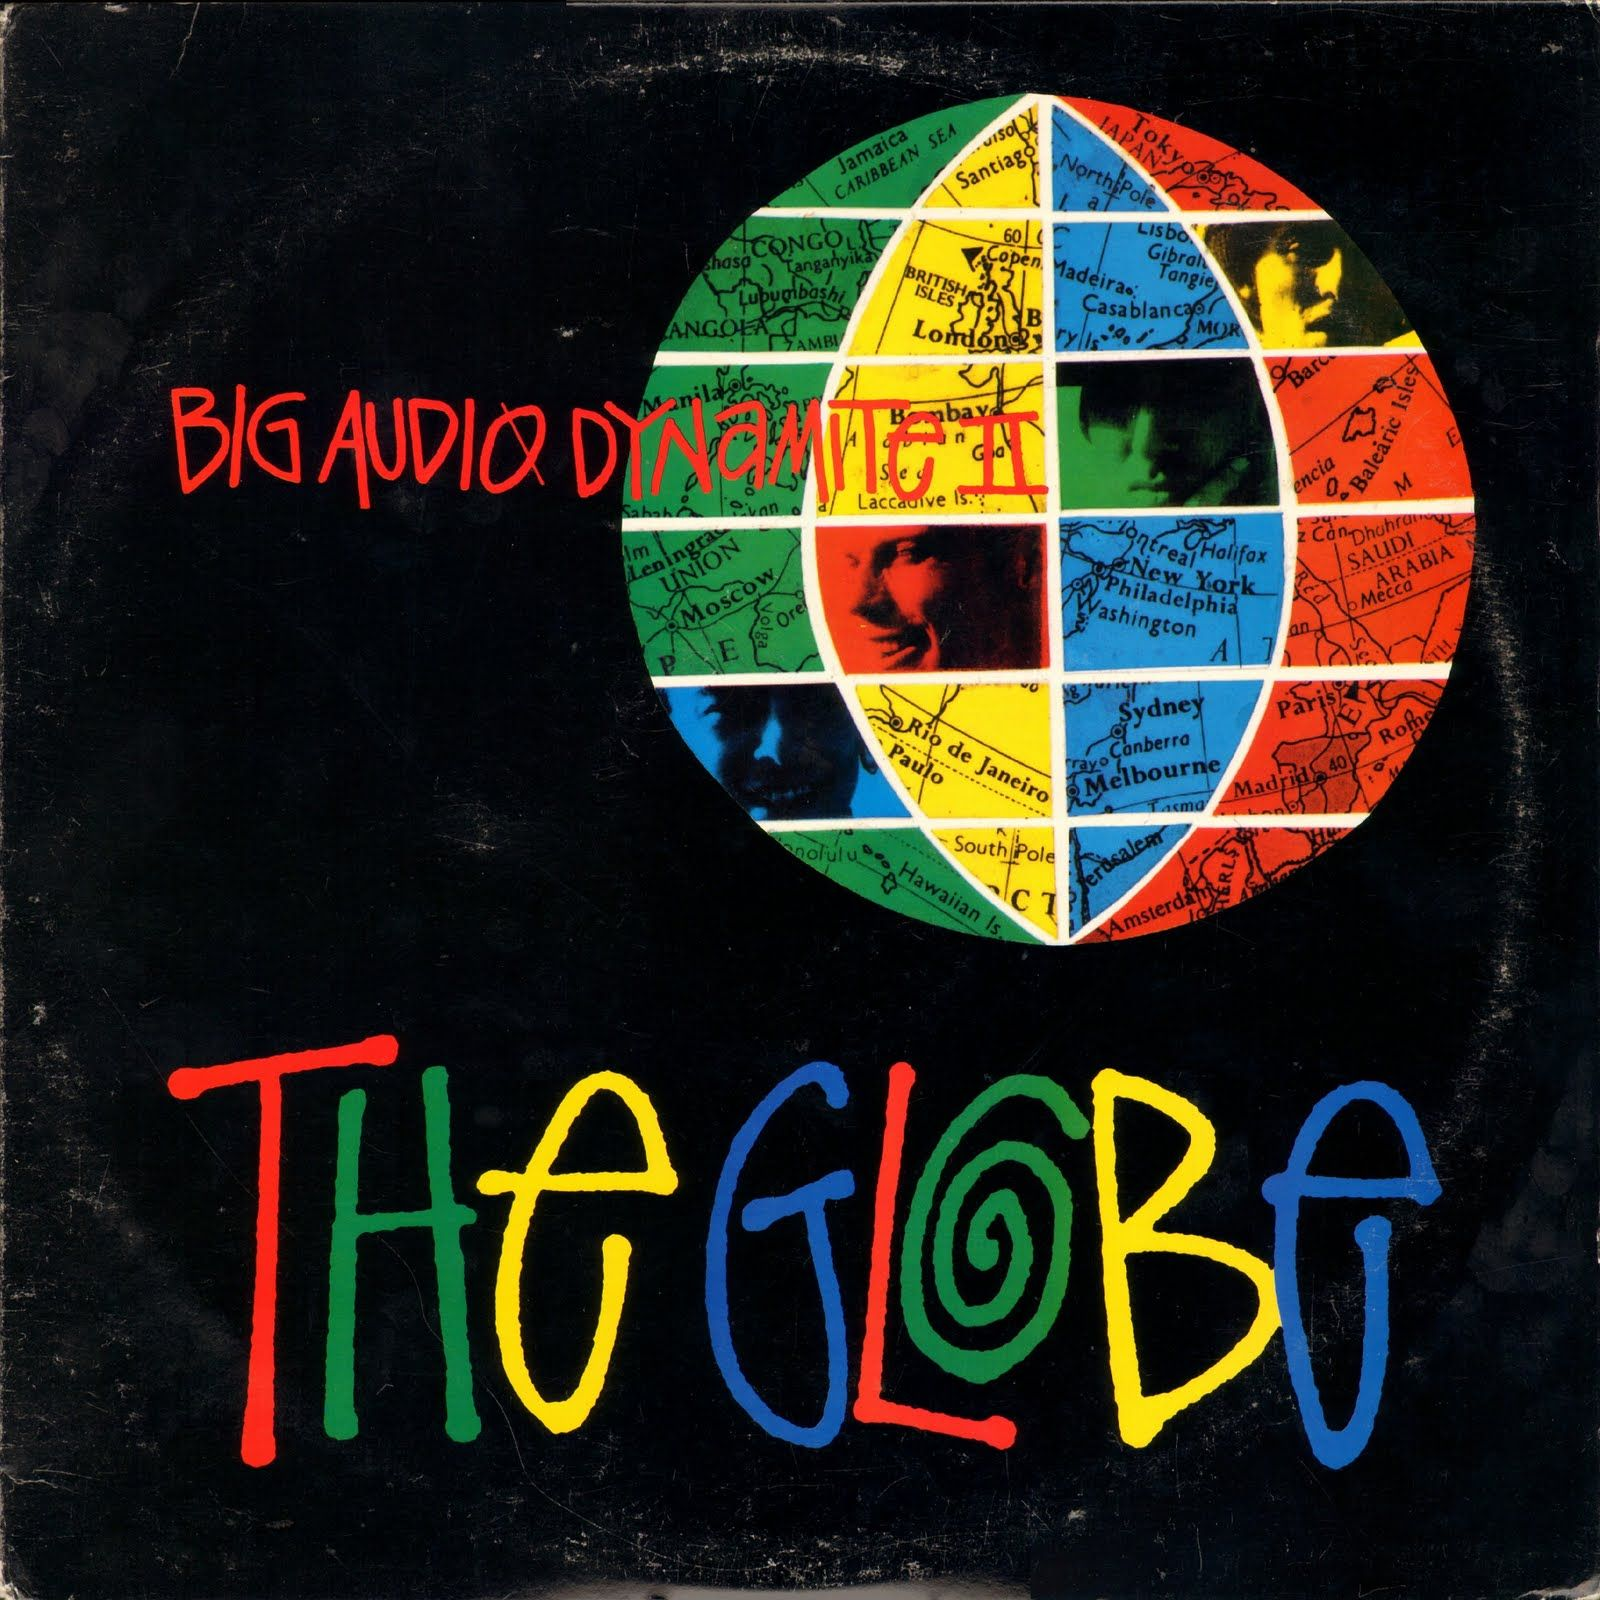 Big Audio Dynamite II The Globe Rock cover, Alphabet